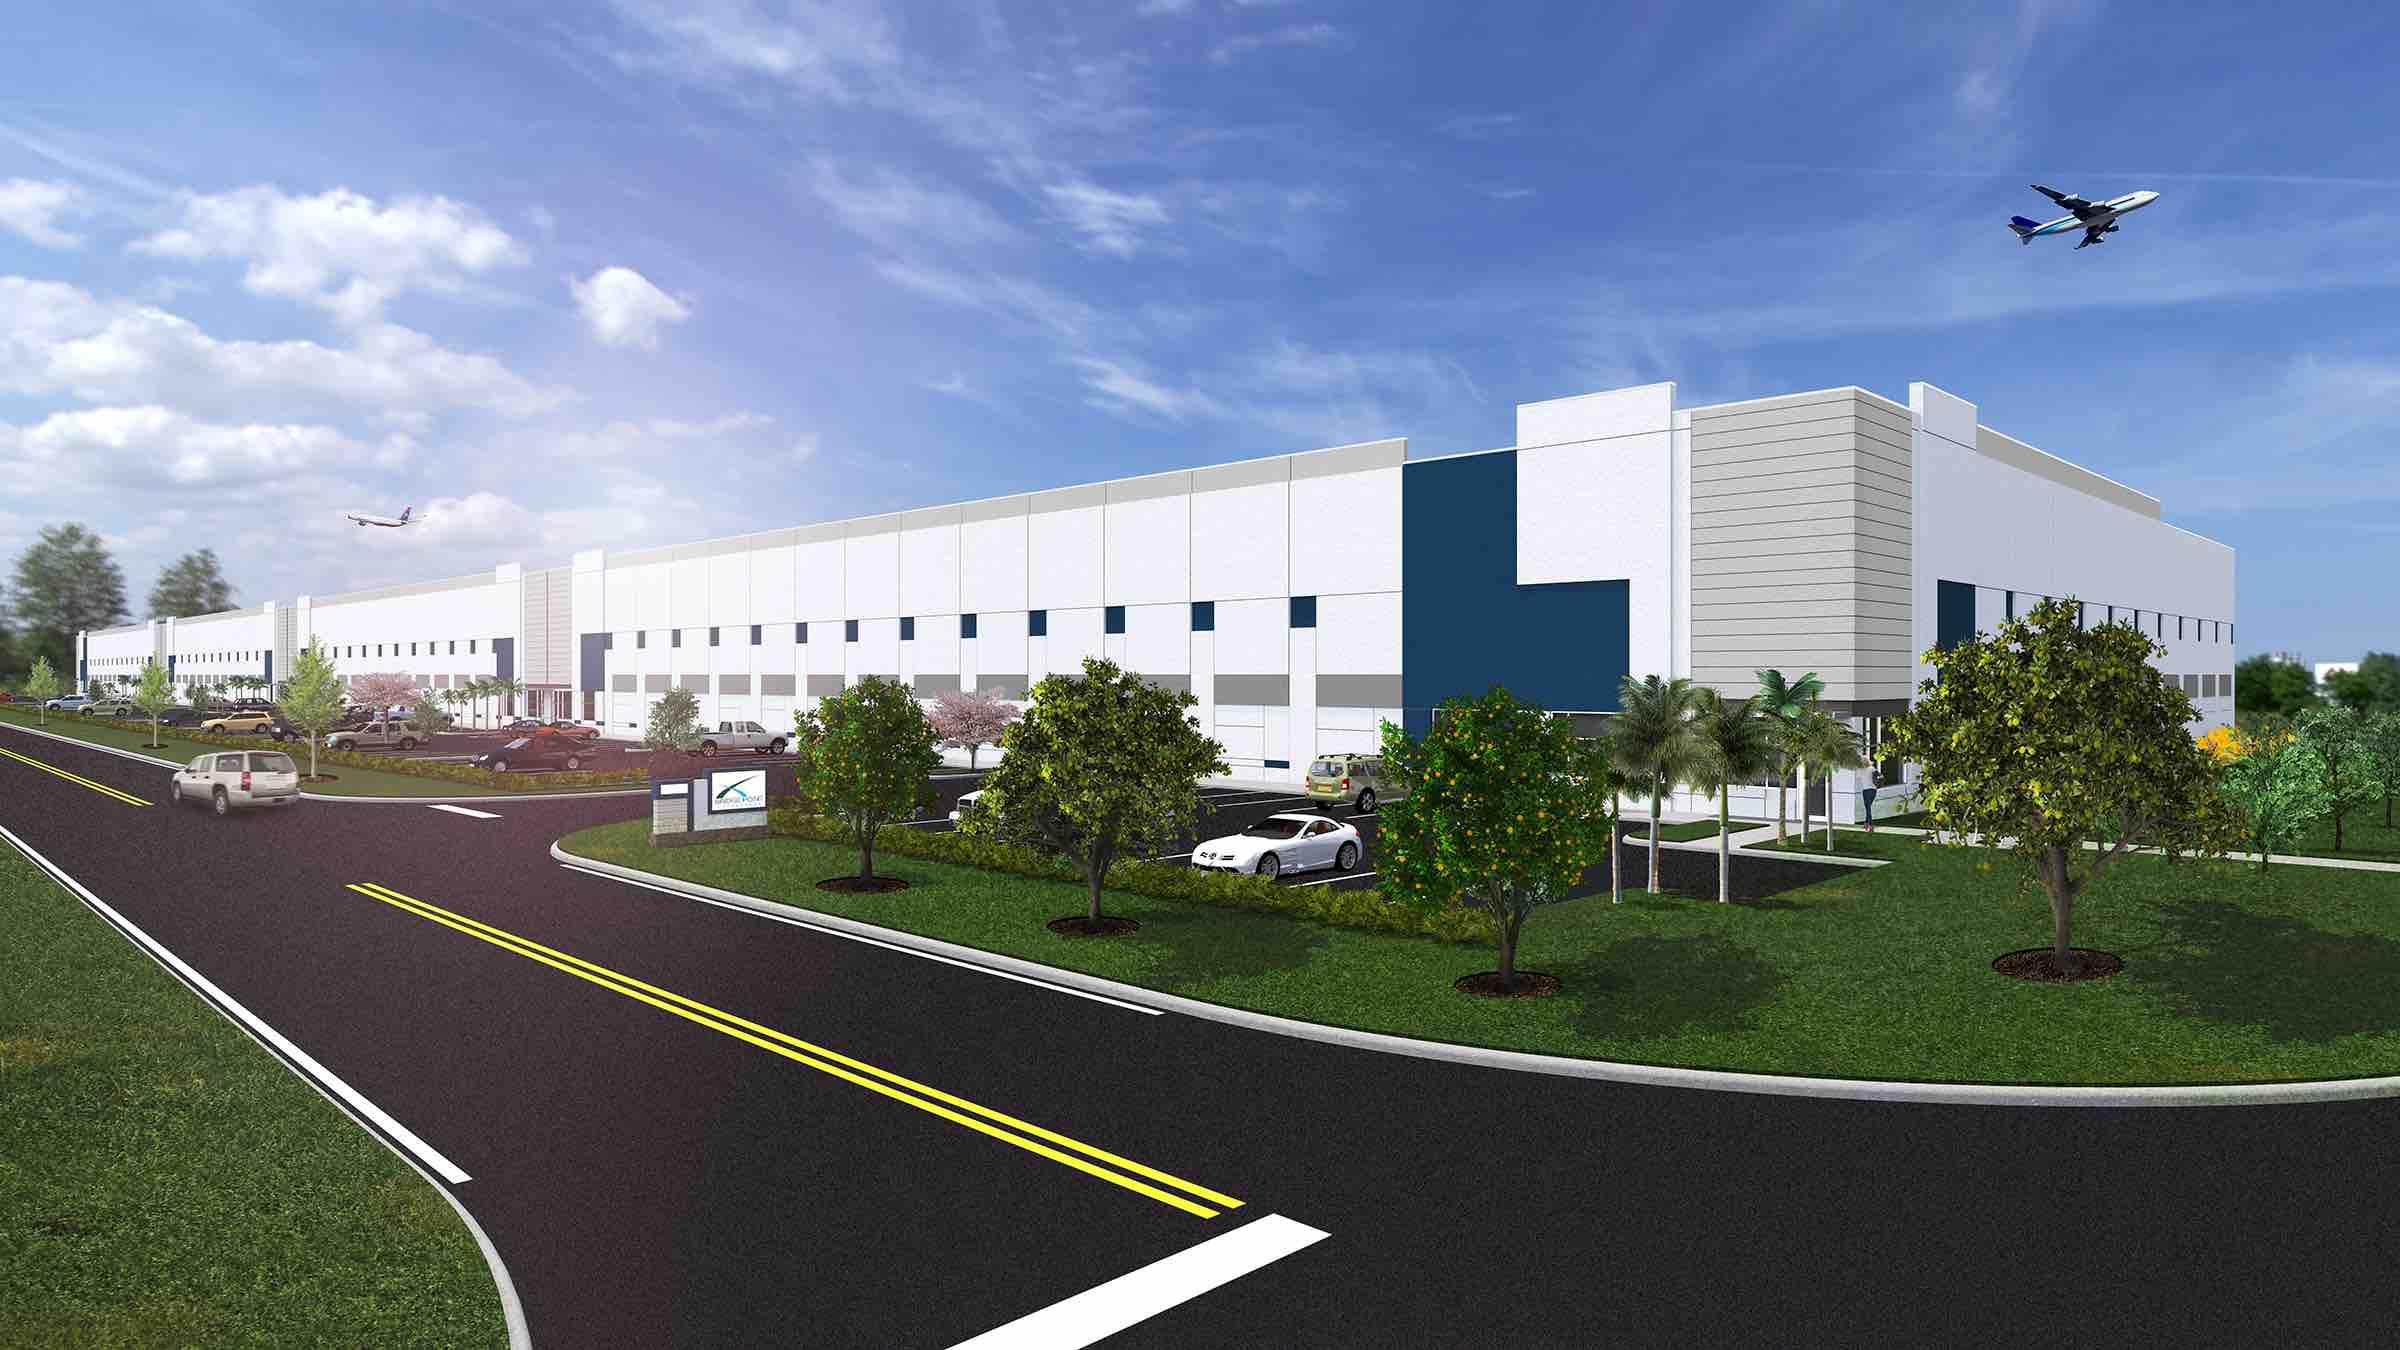 Premier Design Build Group Llc Takes Lead Constructing 242859 Sq